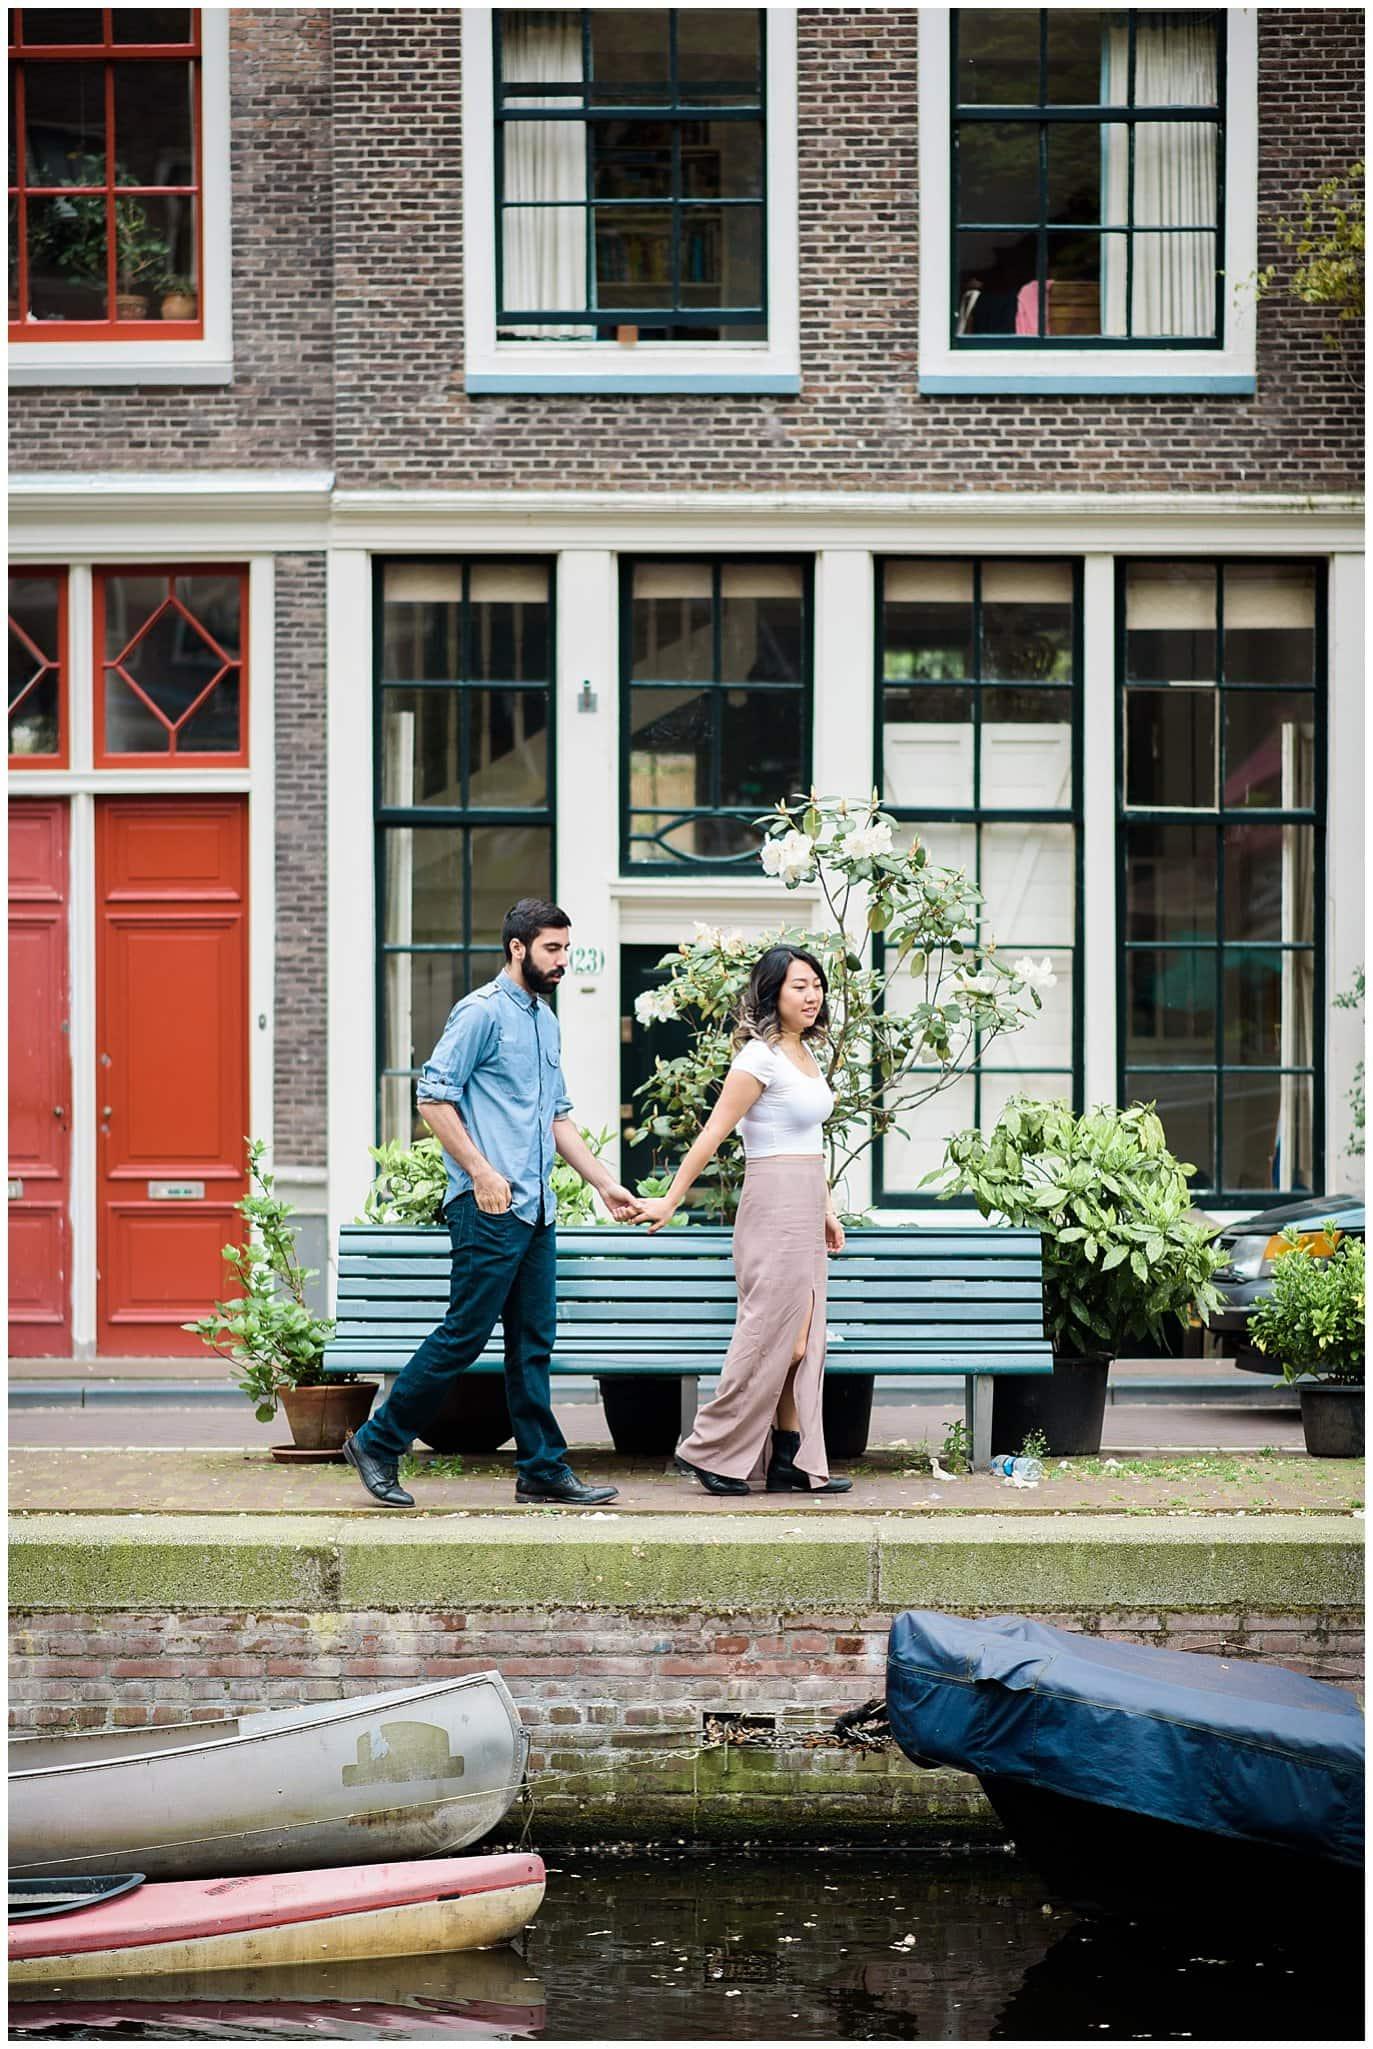 Anniversary session in Jordaan Amsterdam Netherlands photo